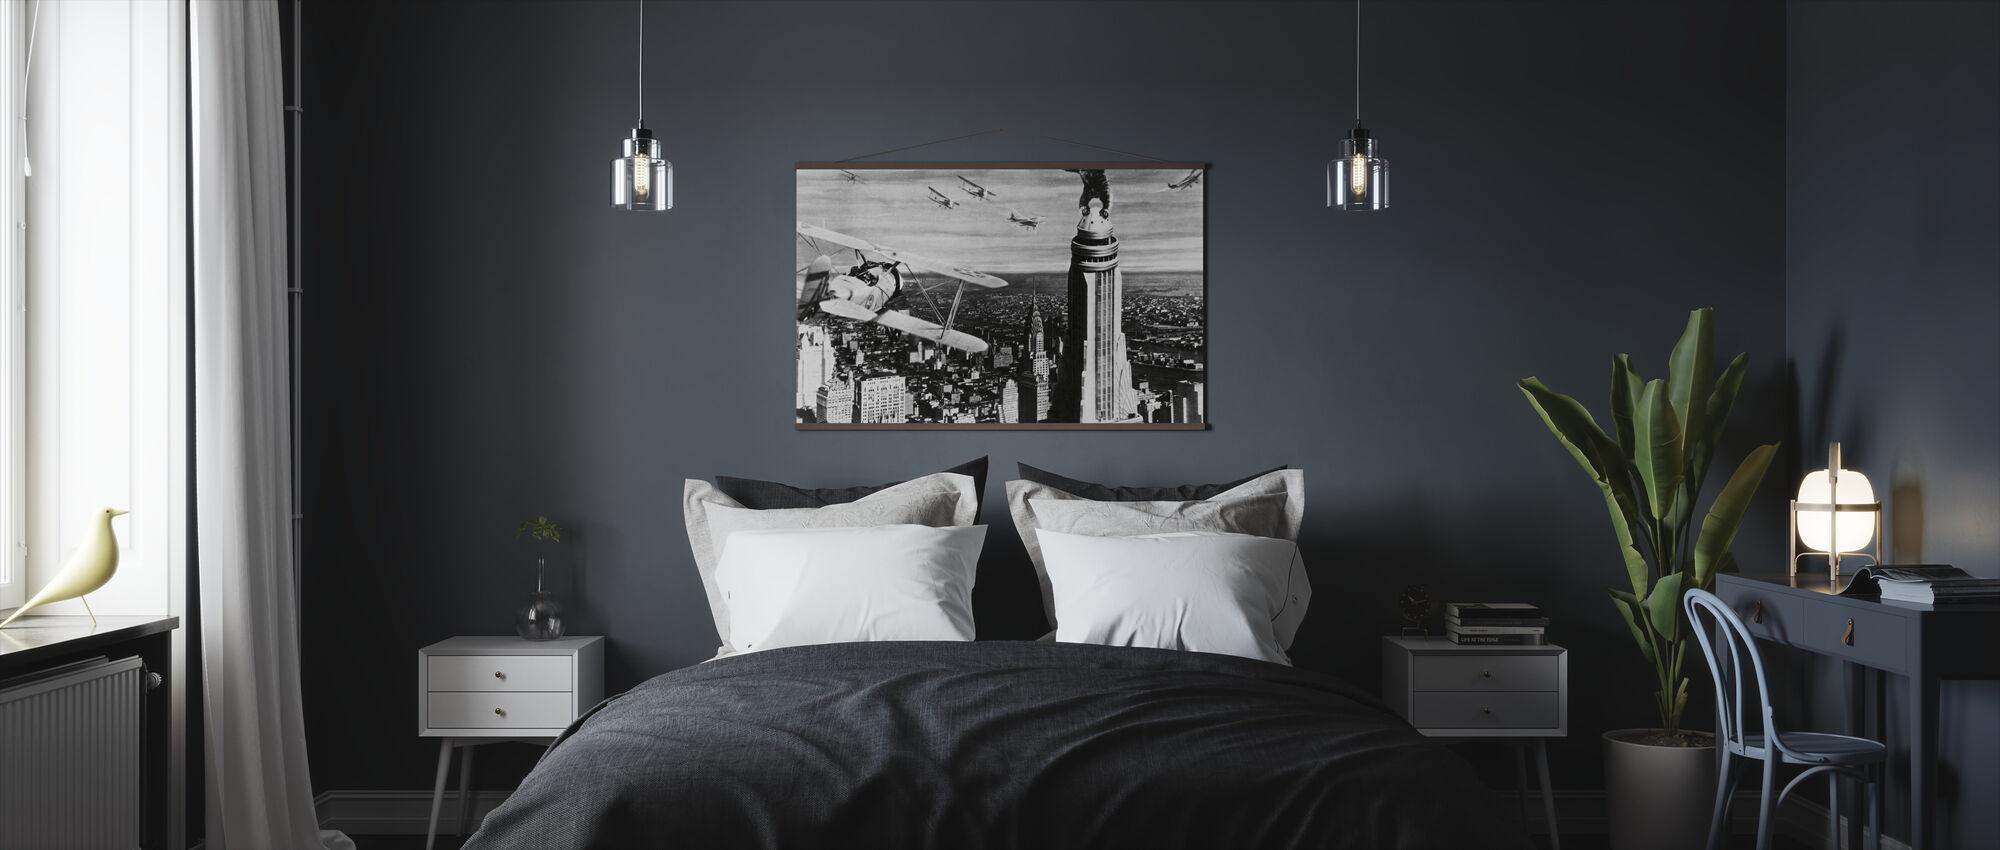 King Kong - Poster - Bedroom